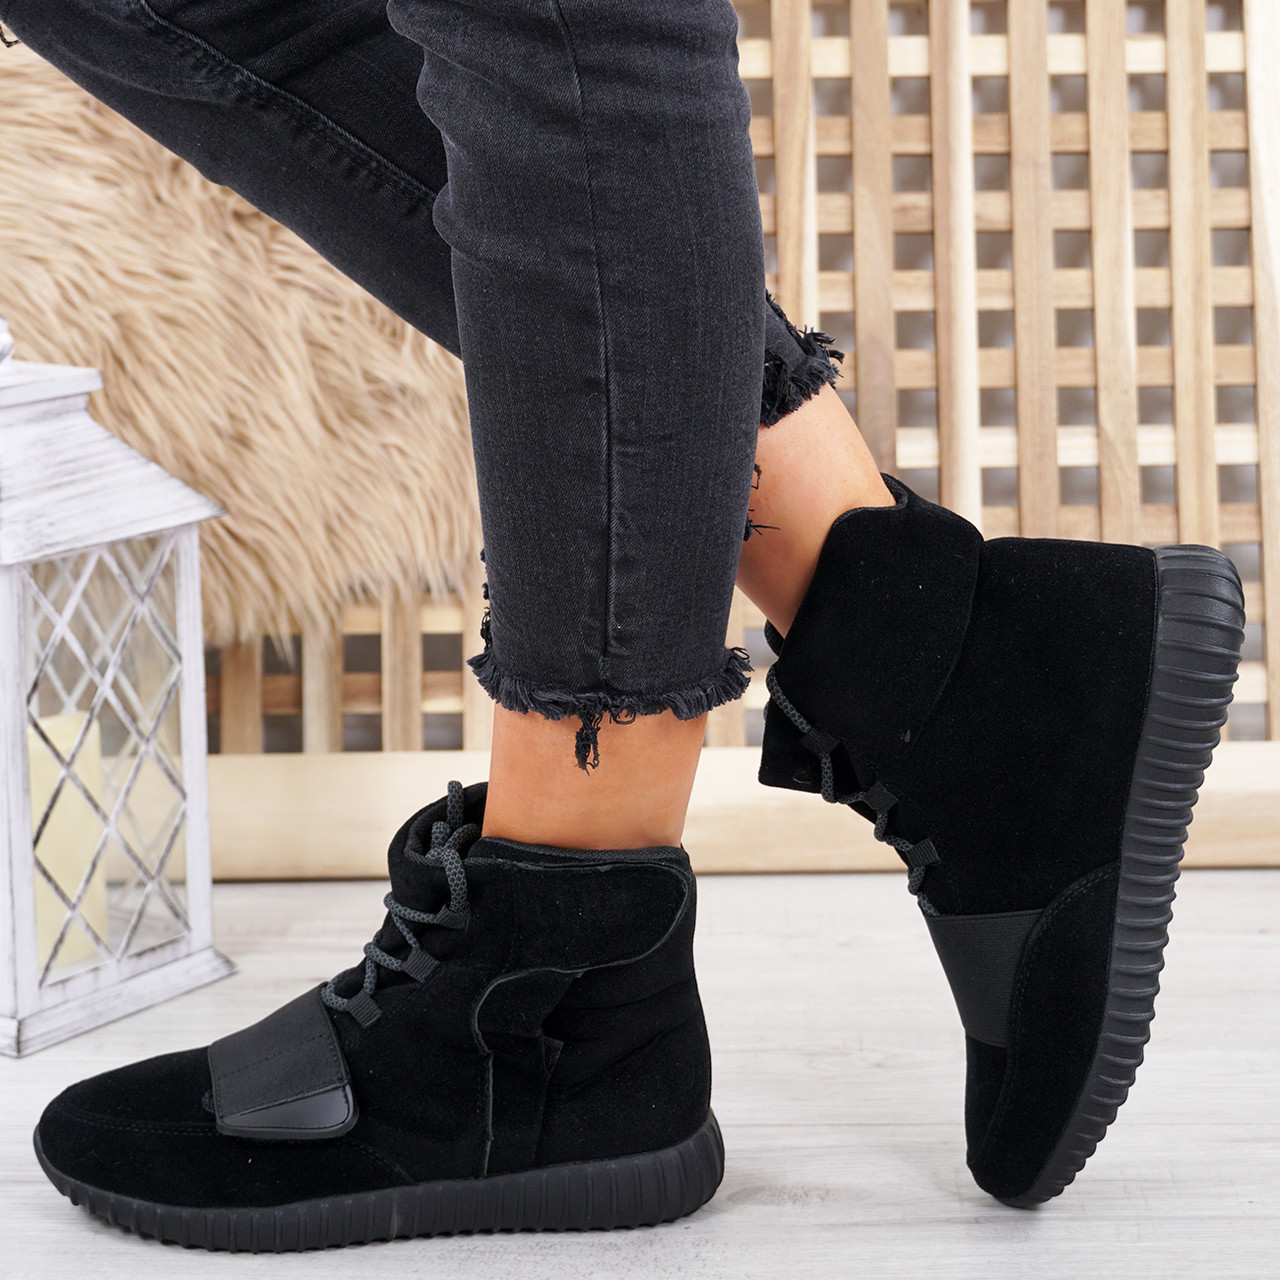 b0b06a0054b Viga Black Trainers Ankle Boots